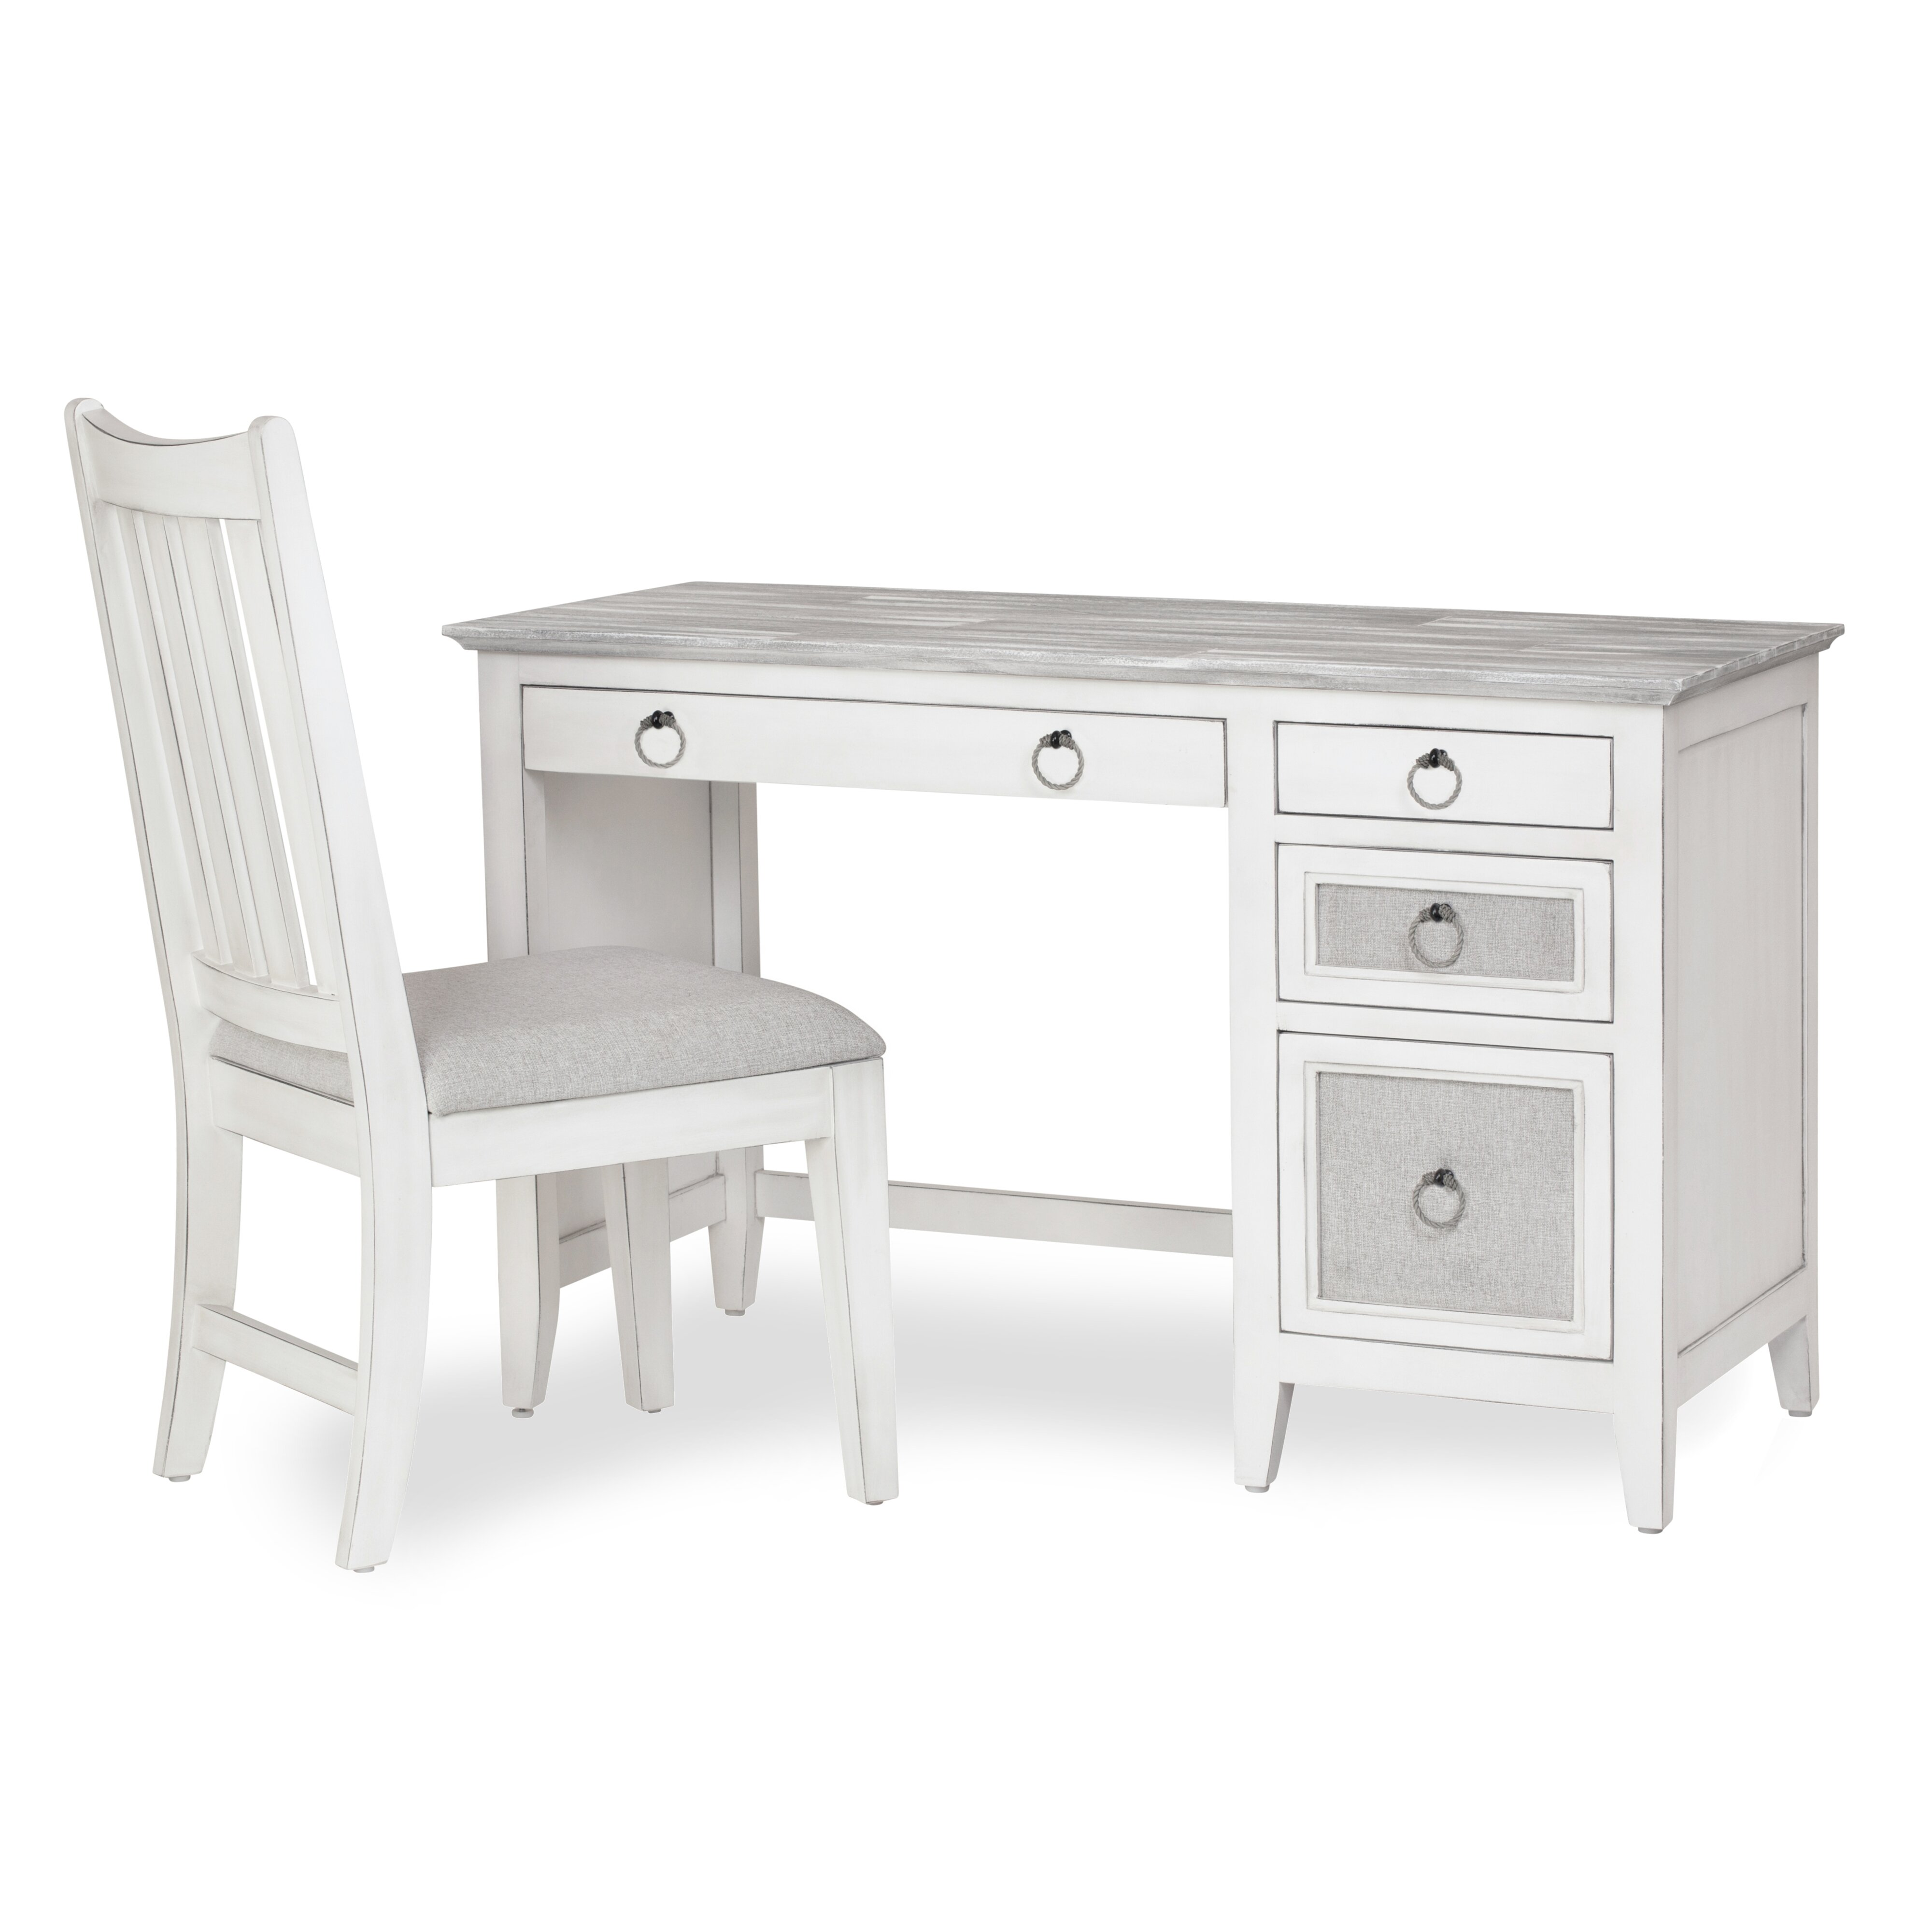 Fine Juliet Island Desk And Chair Set Creativecarmelina Interior Chair Design Creativecarmelinacom